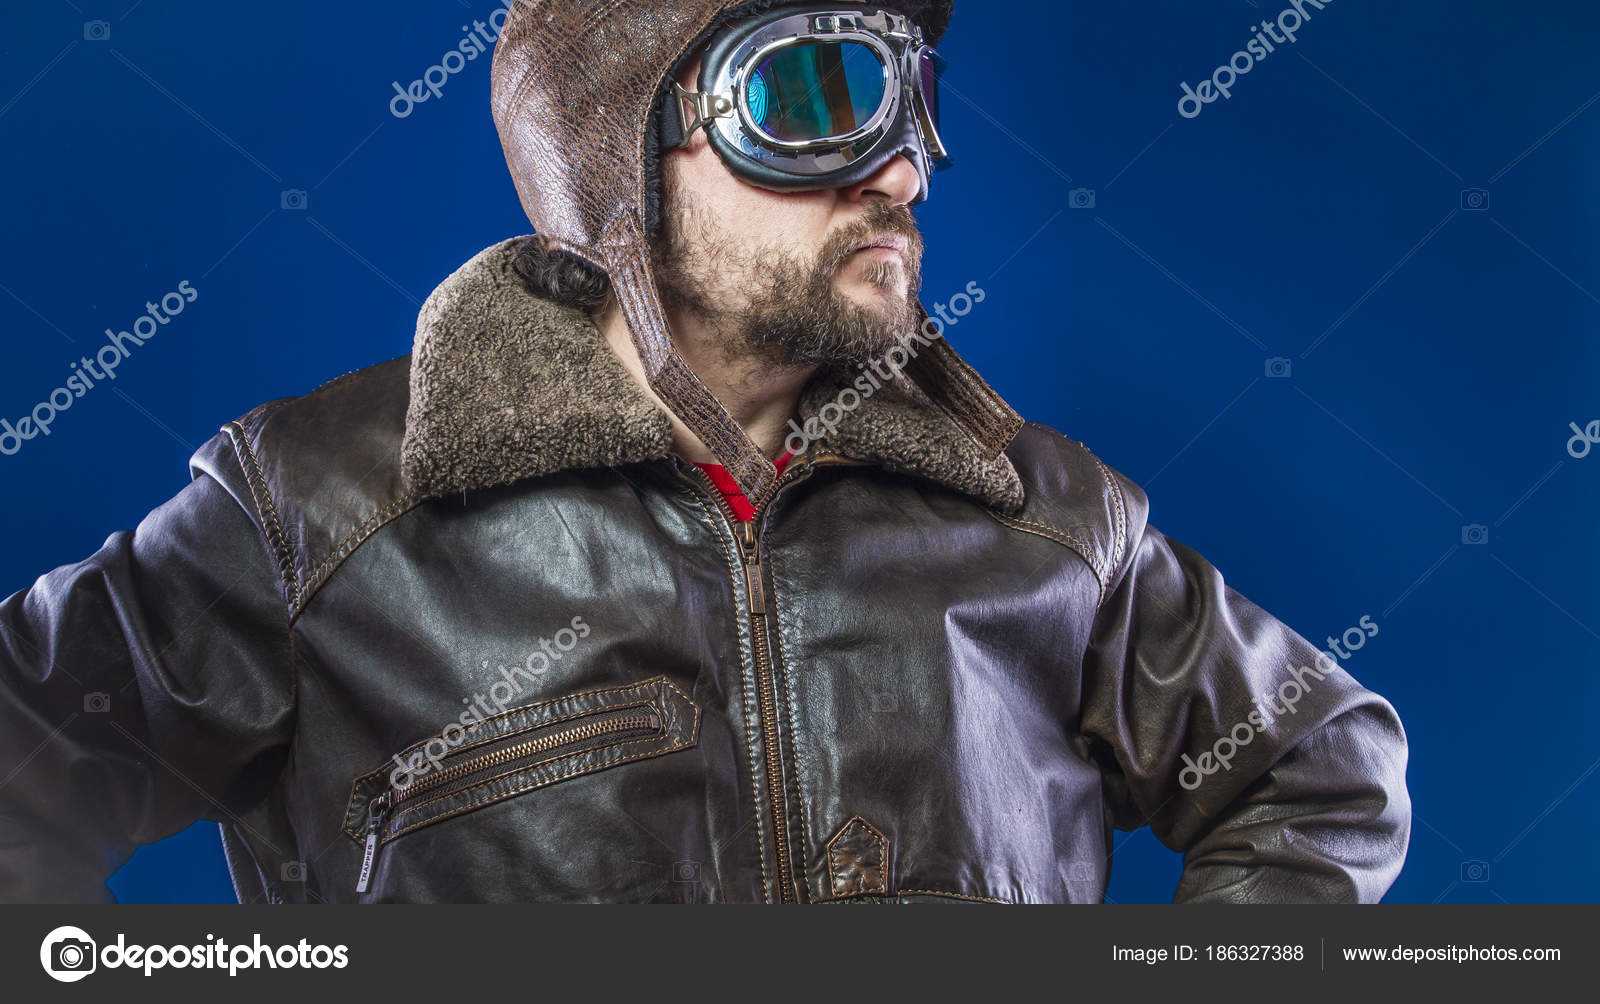 Pilot 20S Sunglasses Vintage Aviator Helmet Wears Leather Jacket Beard —  Stock Photo 17609d4f93